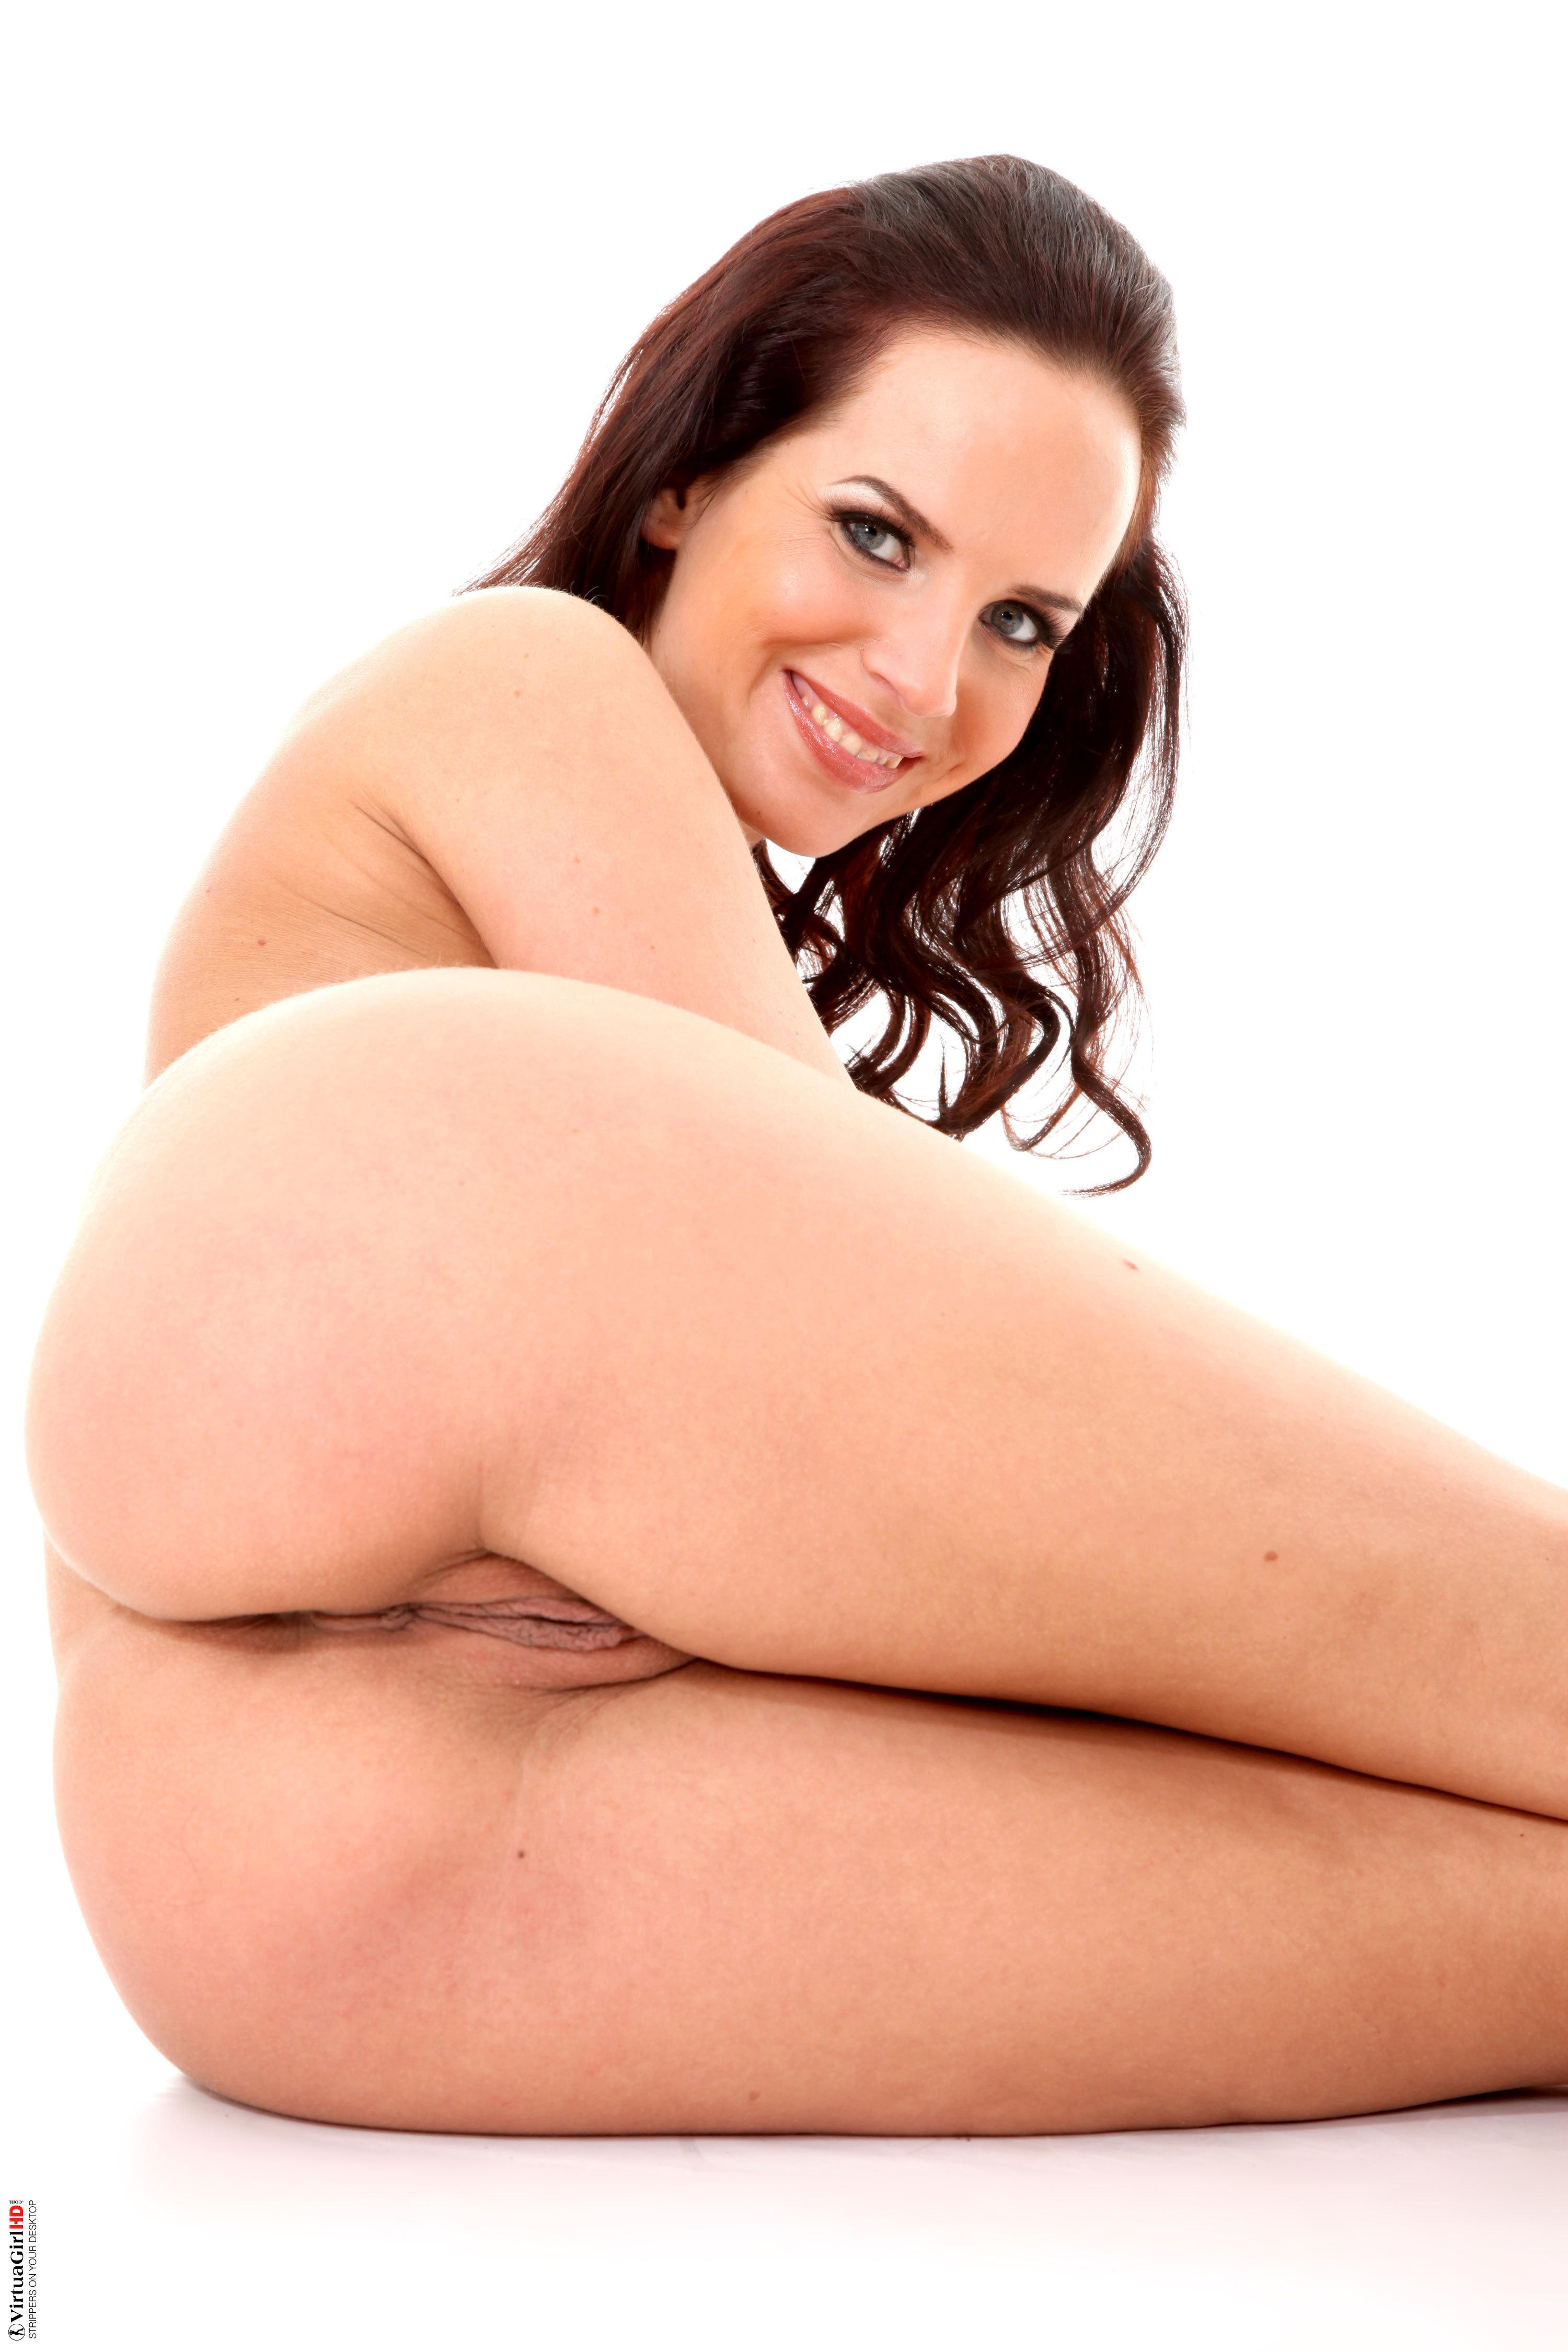 girls stripping dailymotion